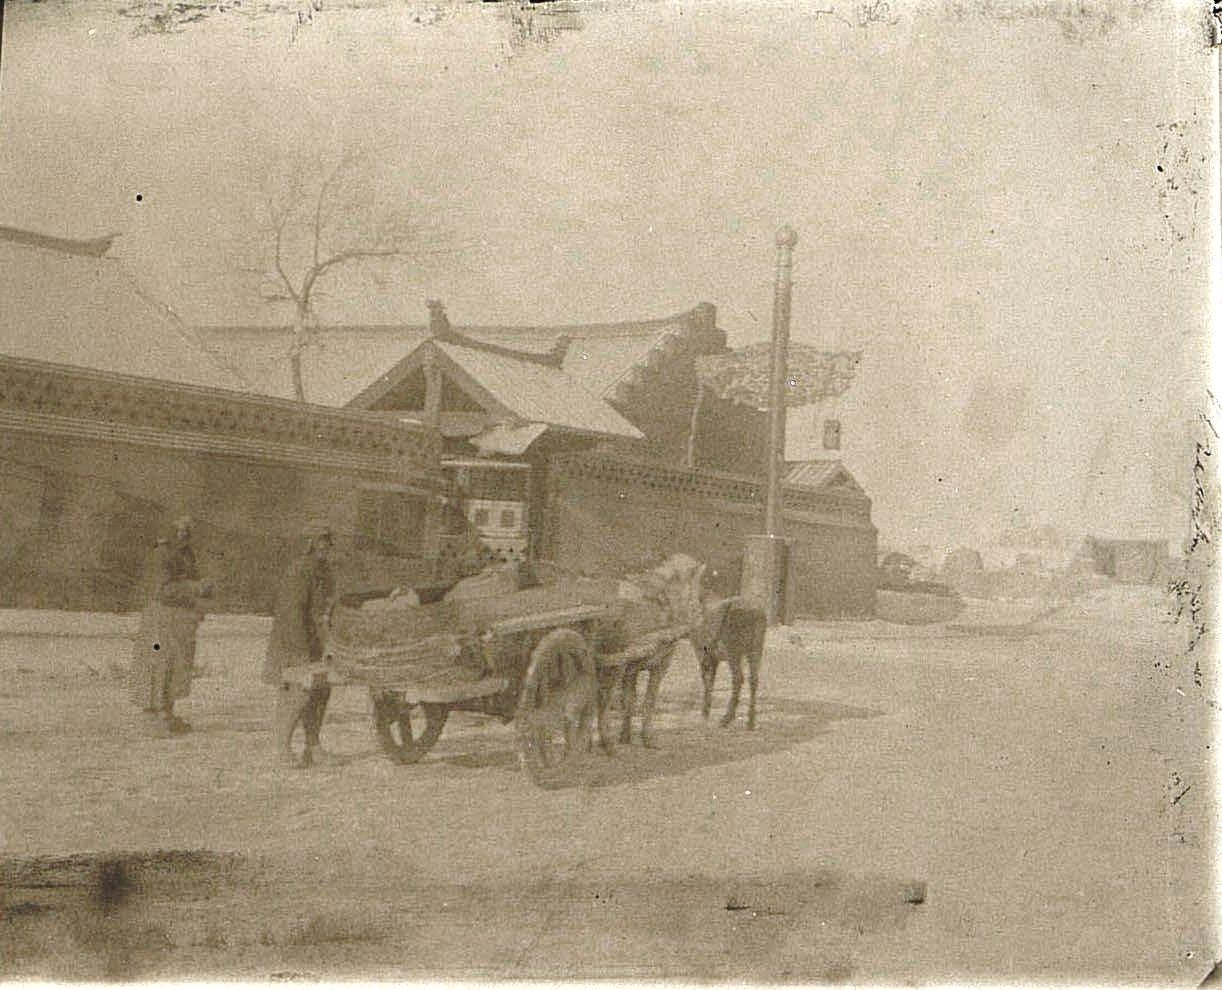 16. Улица в городе Ши-Си-Дян-Дза. Ноябрь 1900